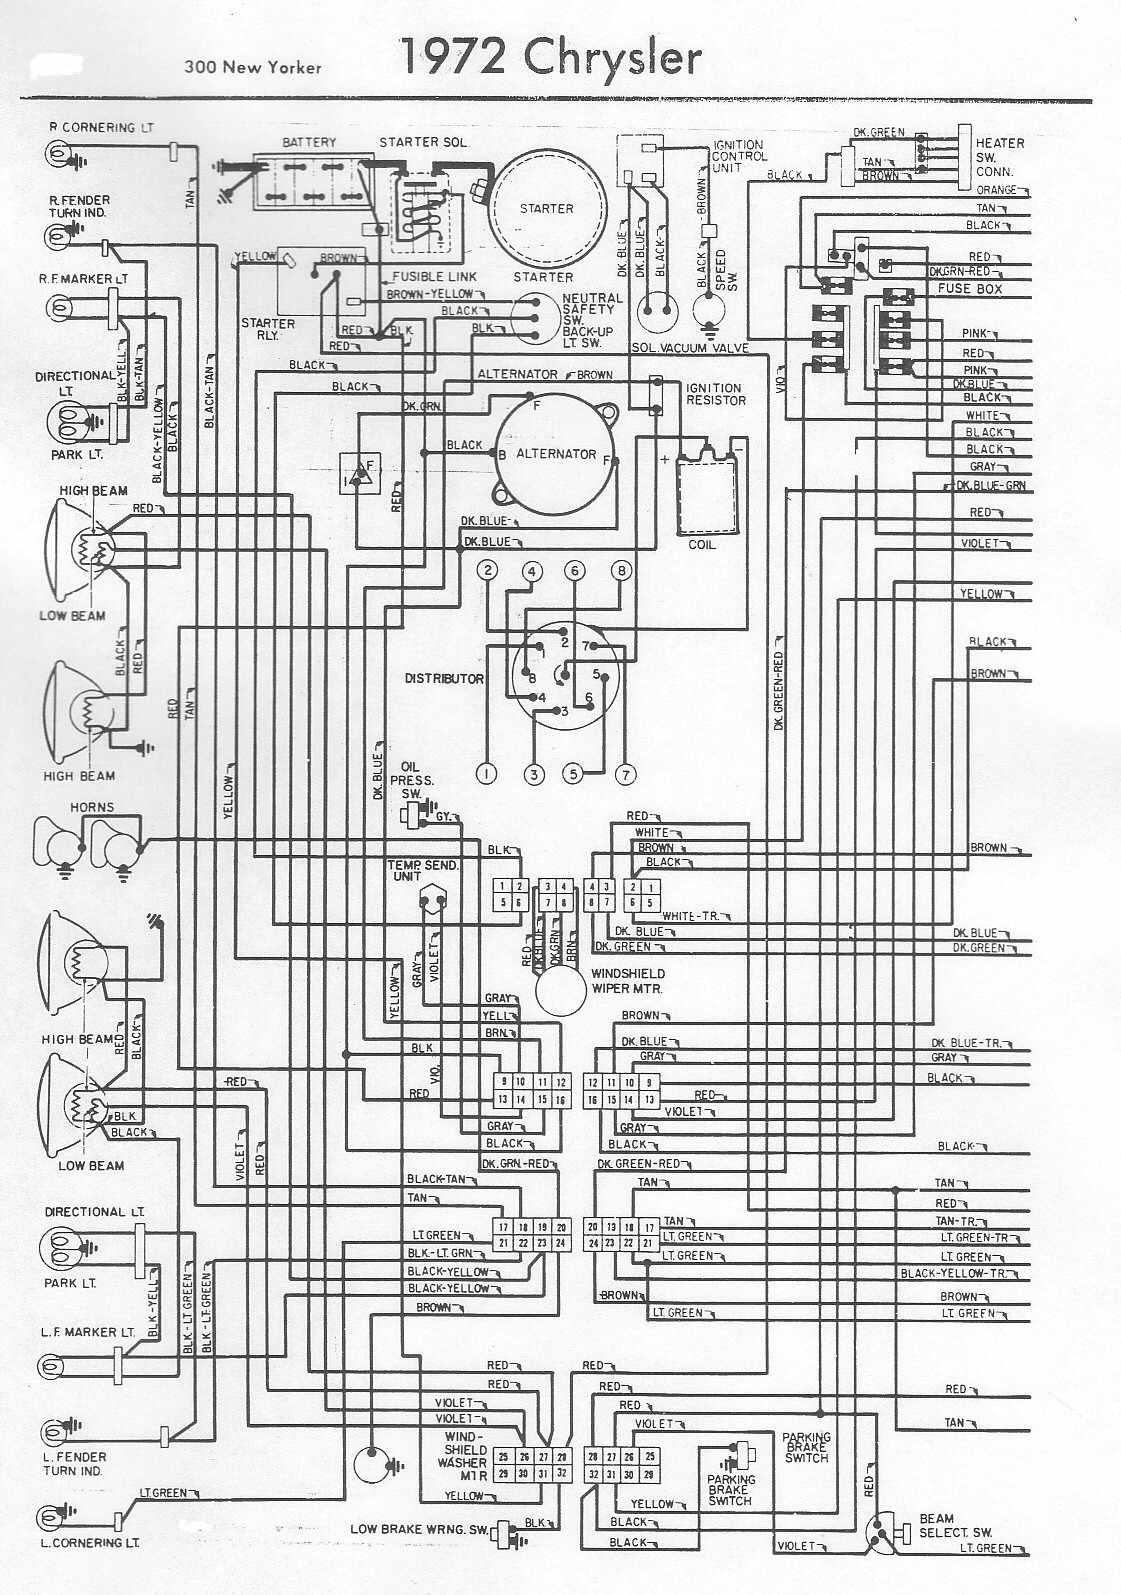 hight resolution of 2002 cadillac deville wiring harness wiring library2000 cadillac eldorado electrical diagrams schematics wiring 2002 cadillac eldorado